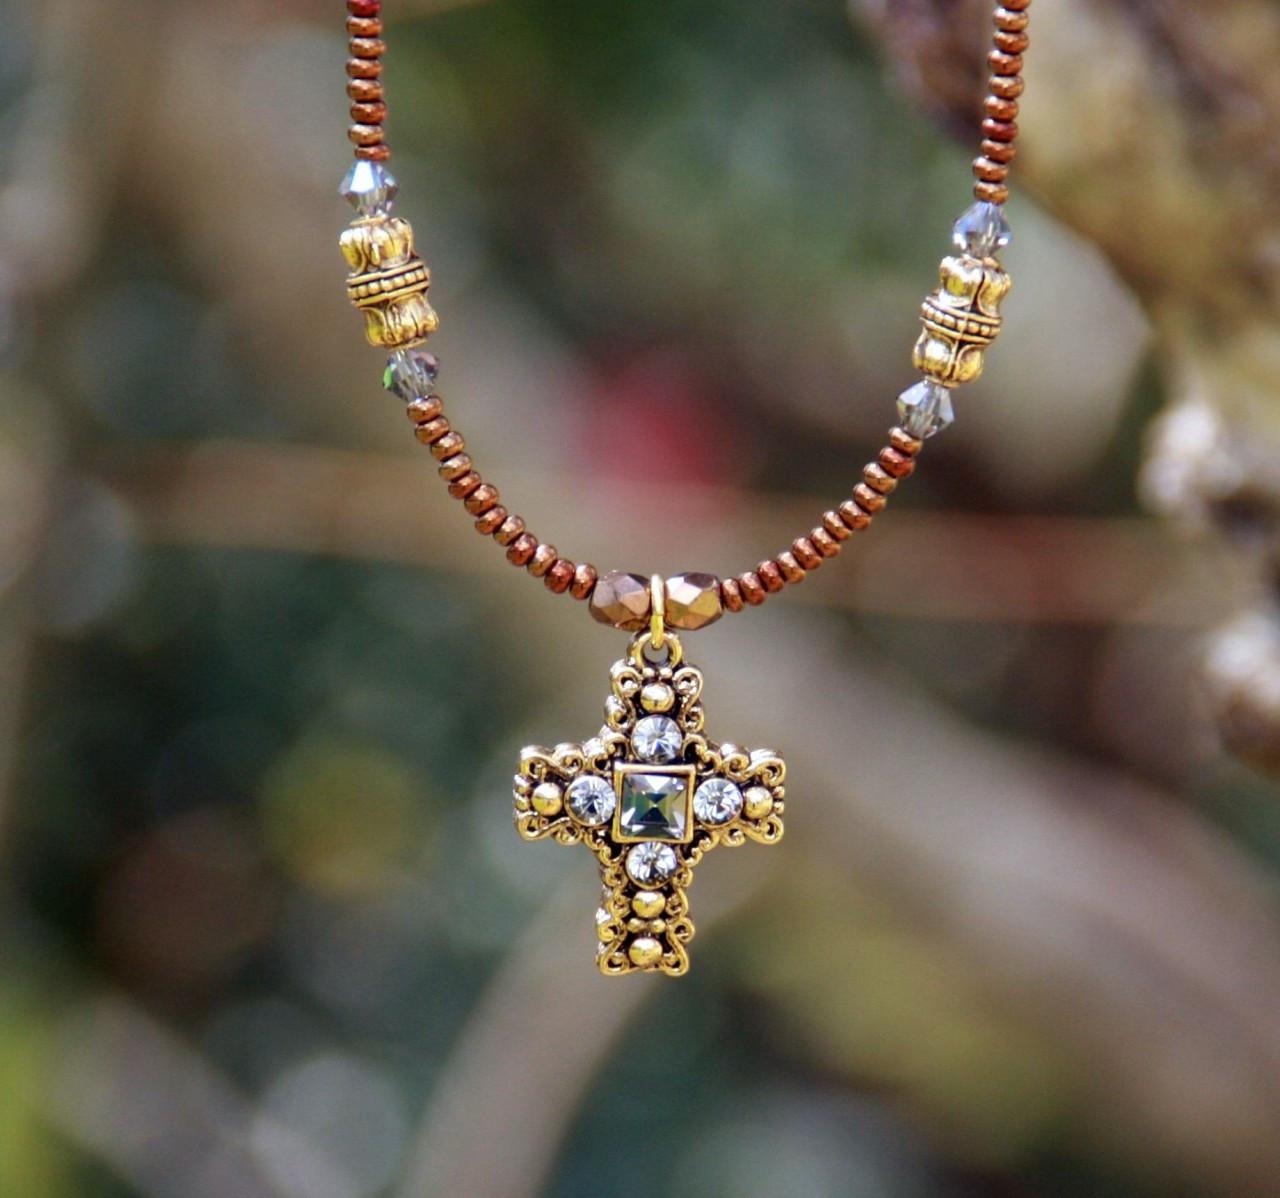 IN-604 Goldtone beautiful cross necklace